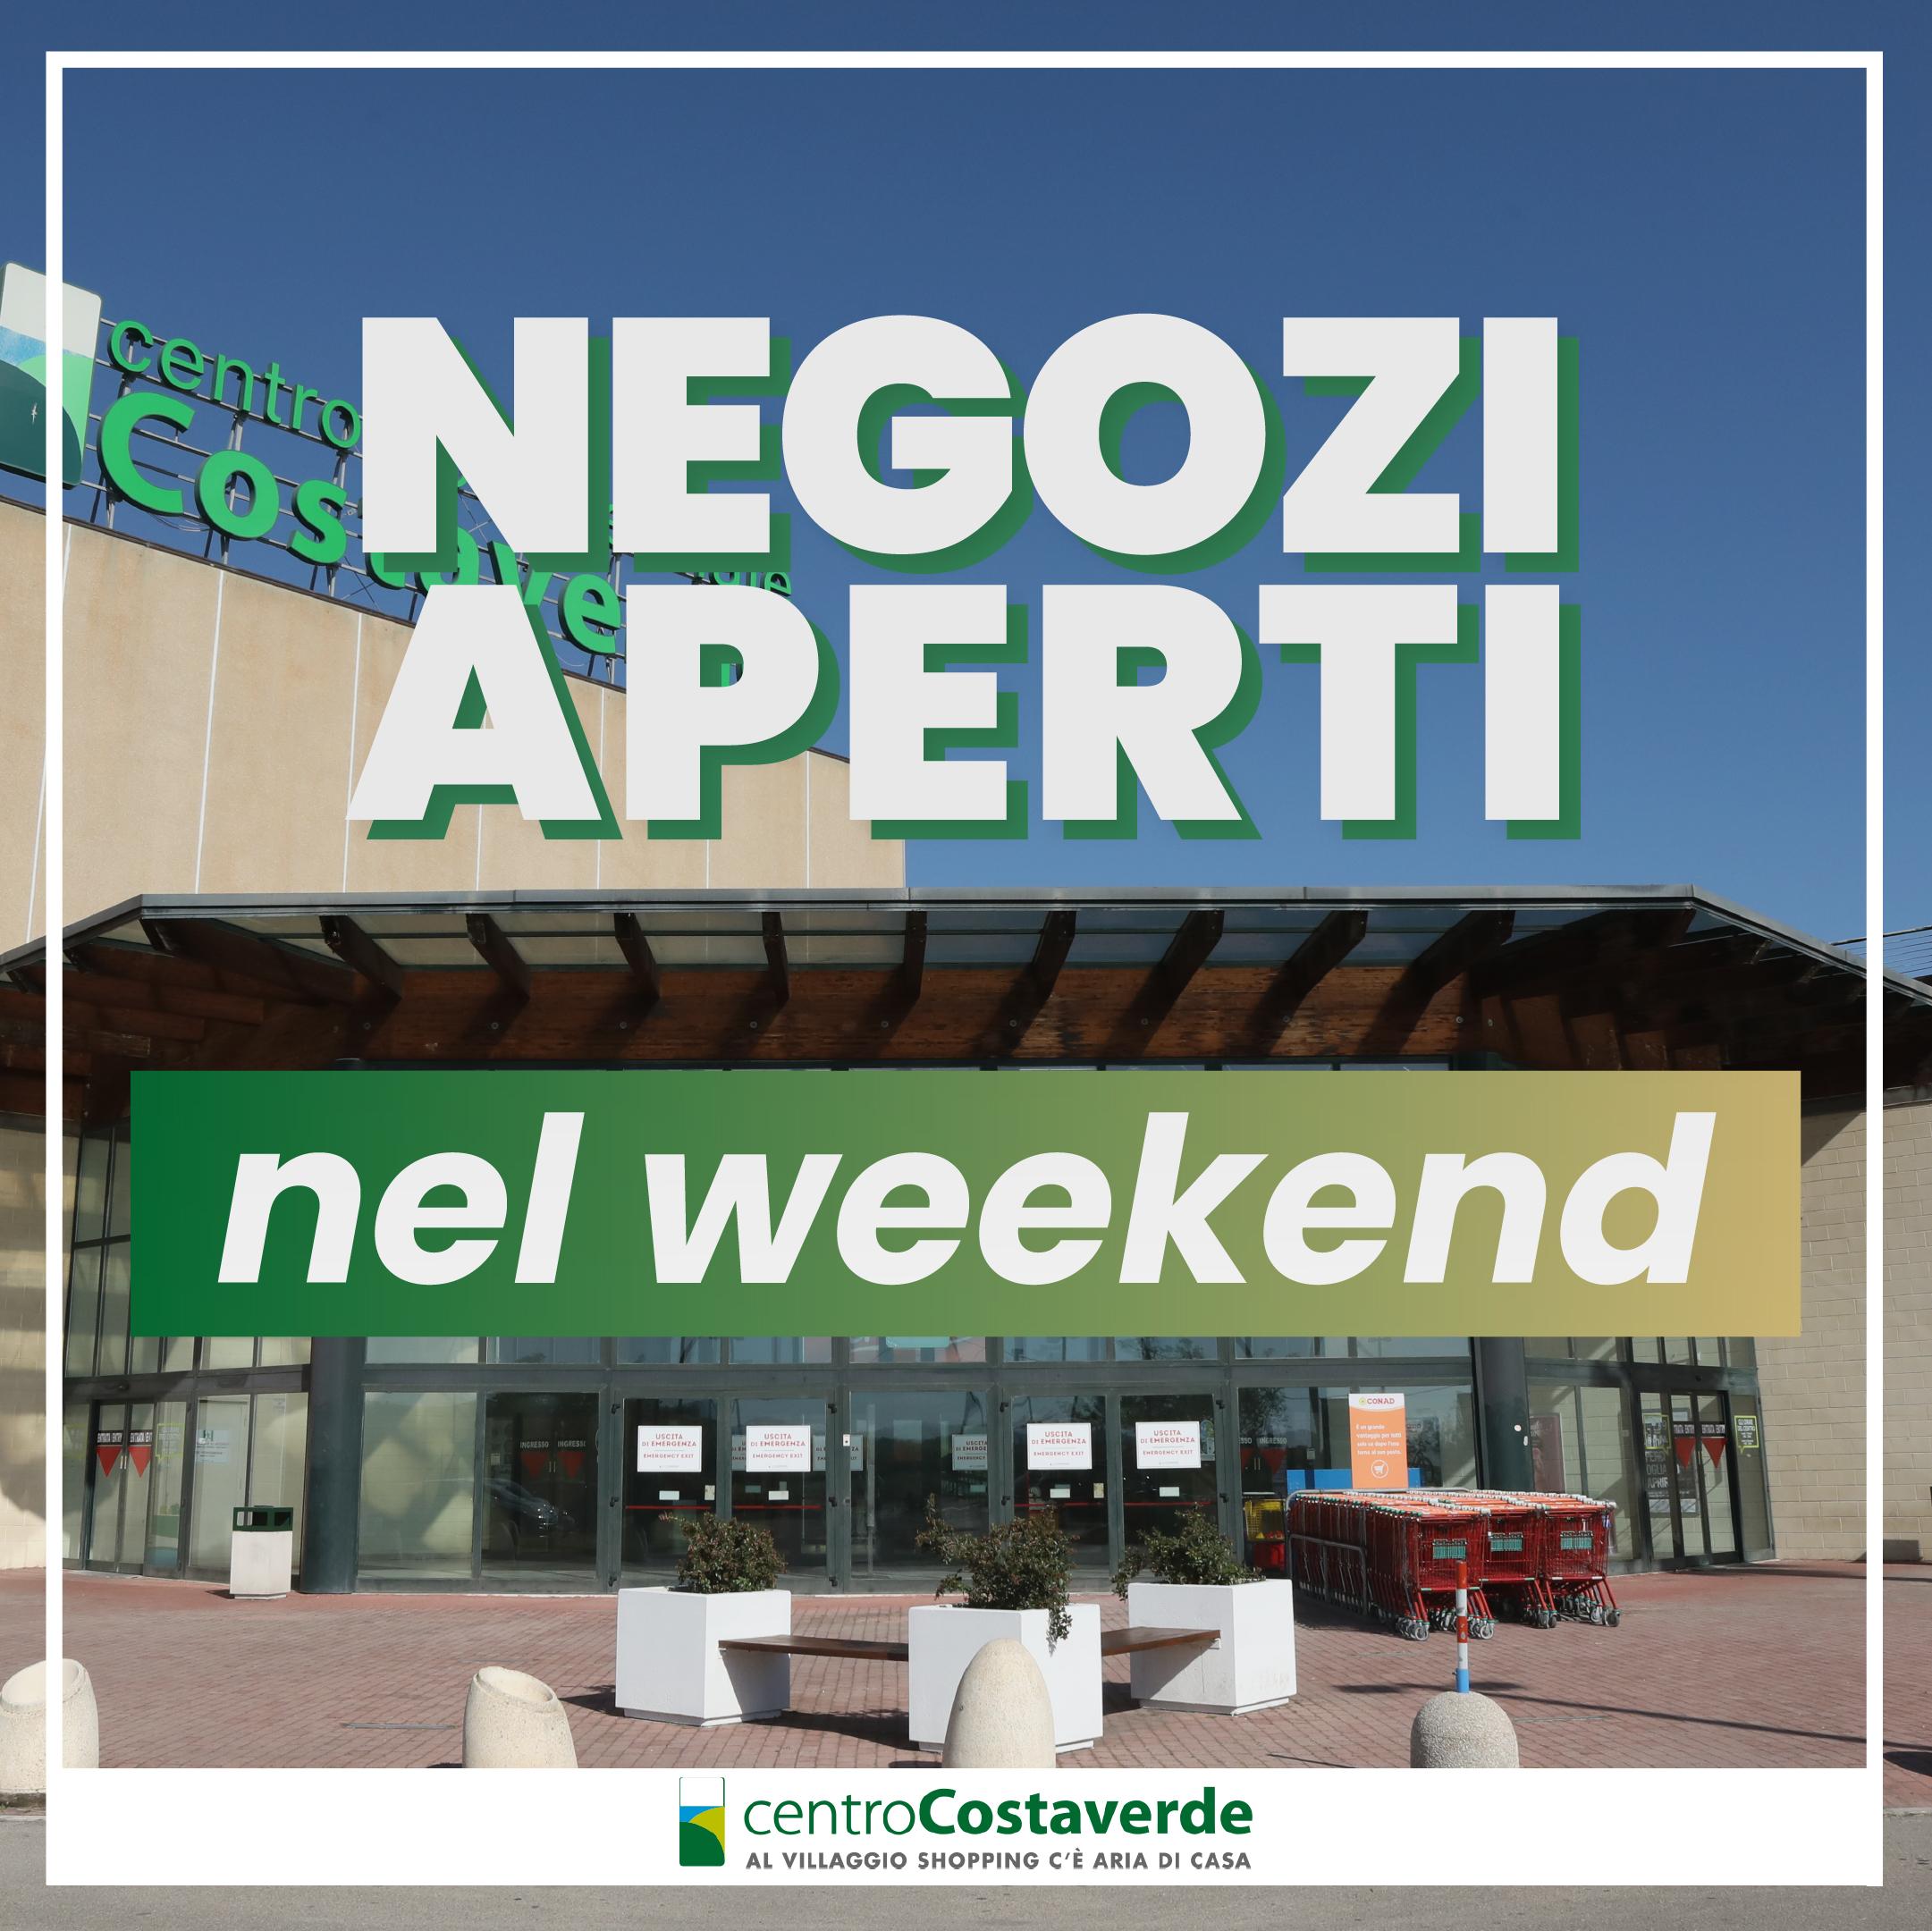 Negozi aperti nel Weekend!